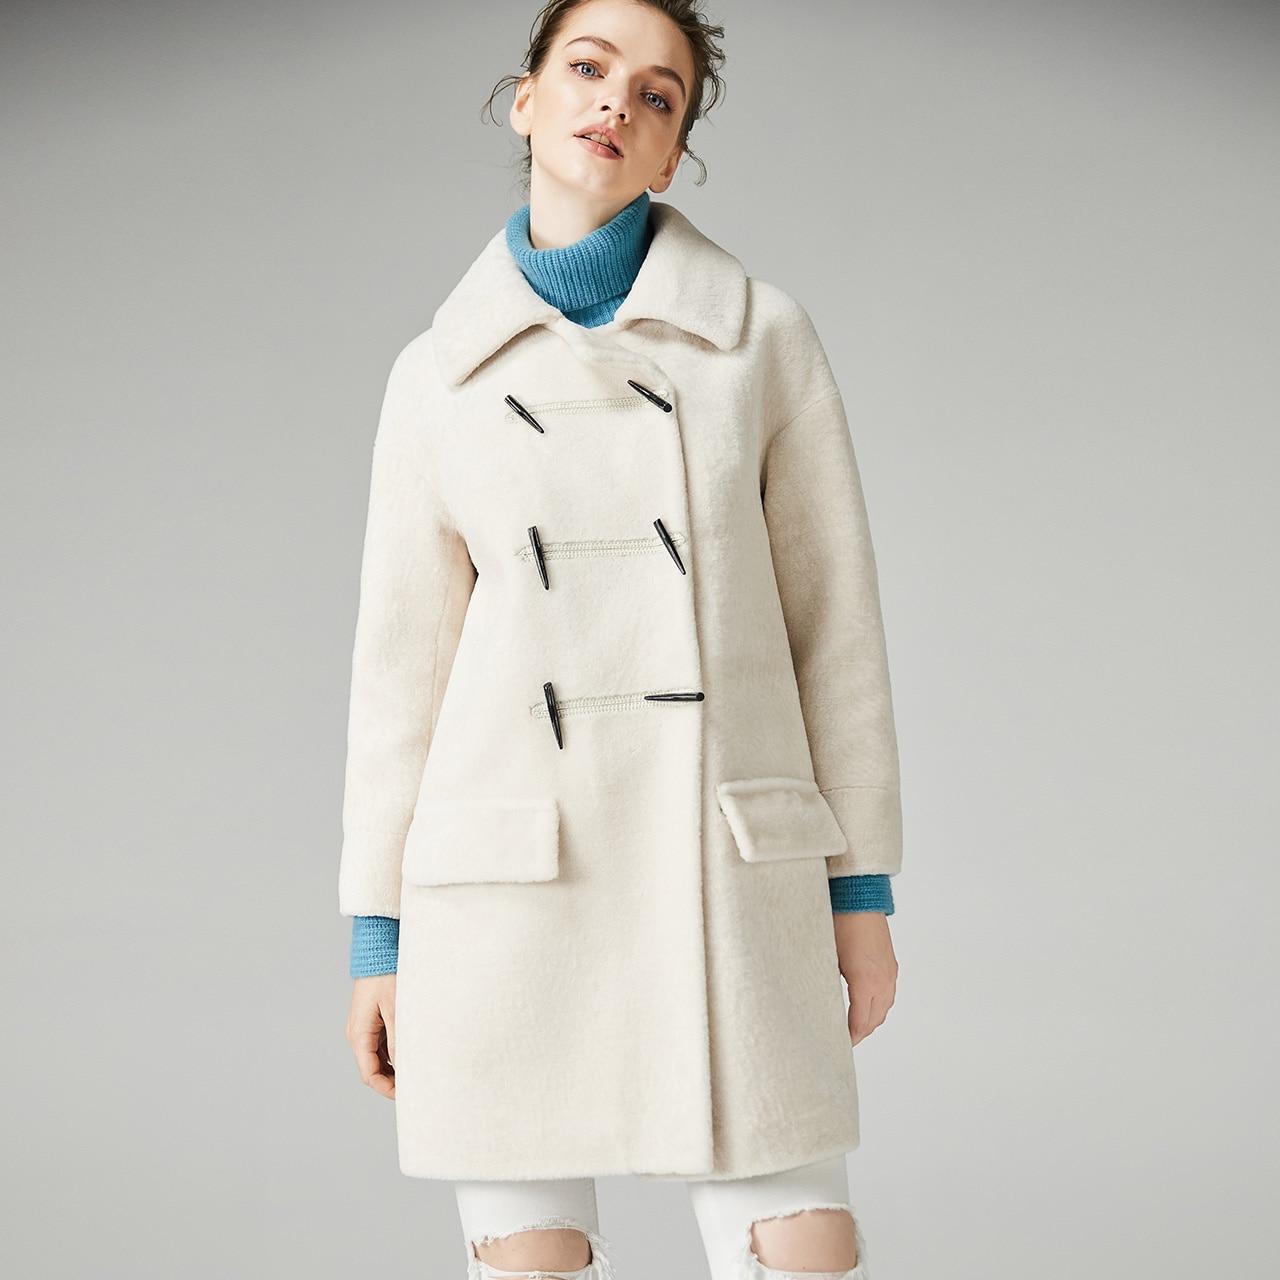 Genuine Fur Coat Women Autumn Winter Warm Thick Sheep Shearing Jackets Top Quality Lamb Fur Parkas V1F32140 MF575